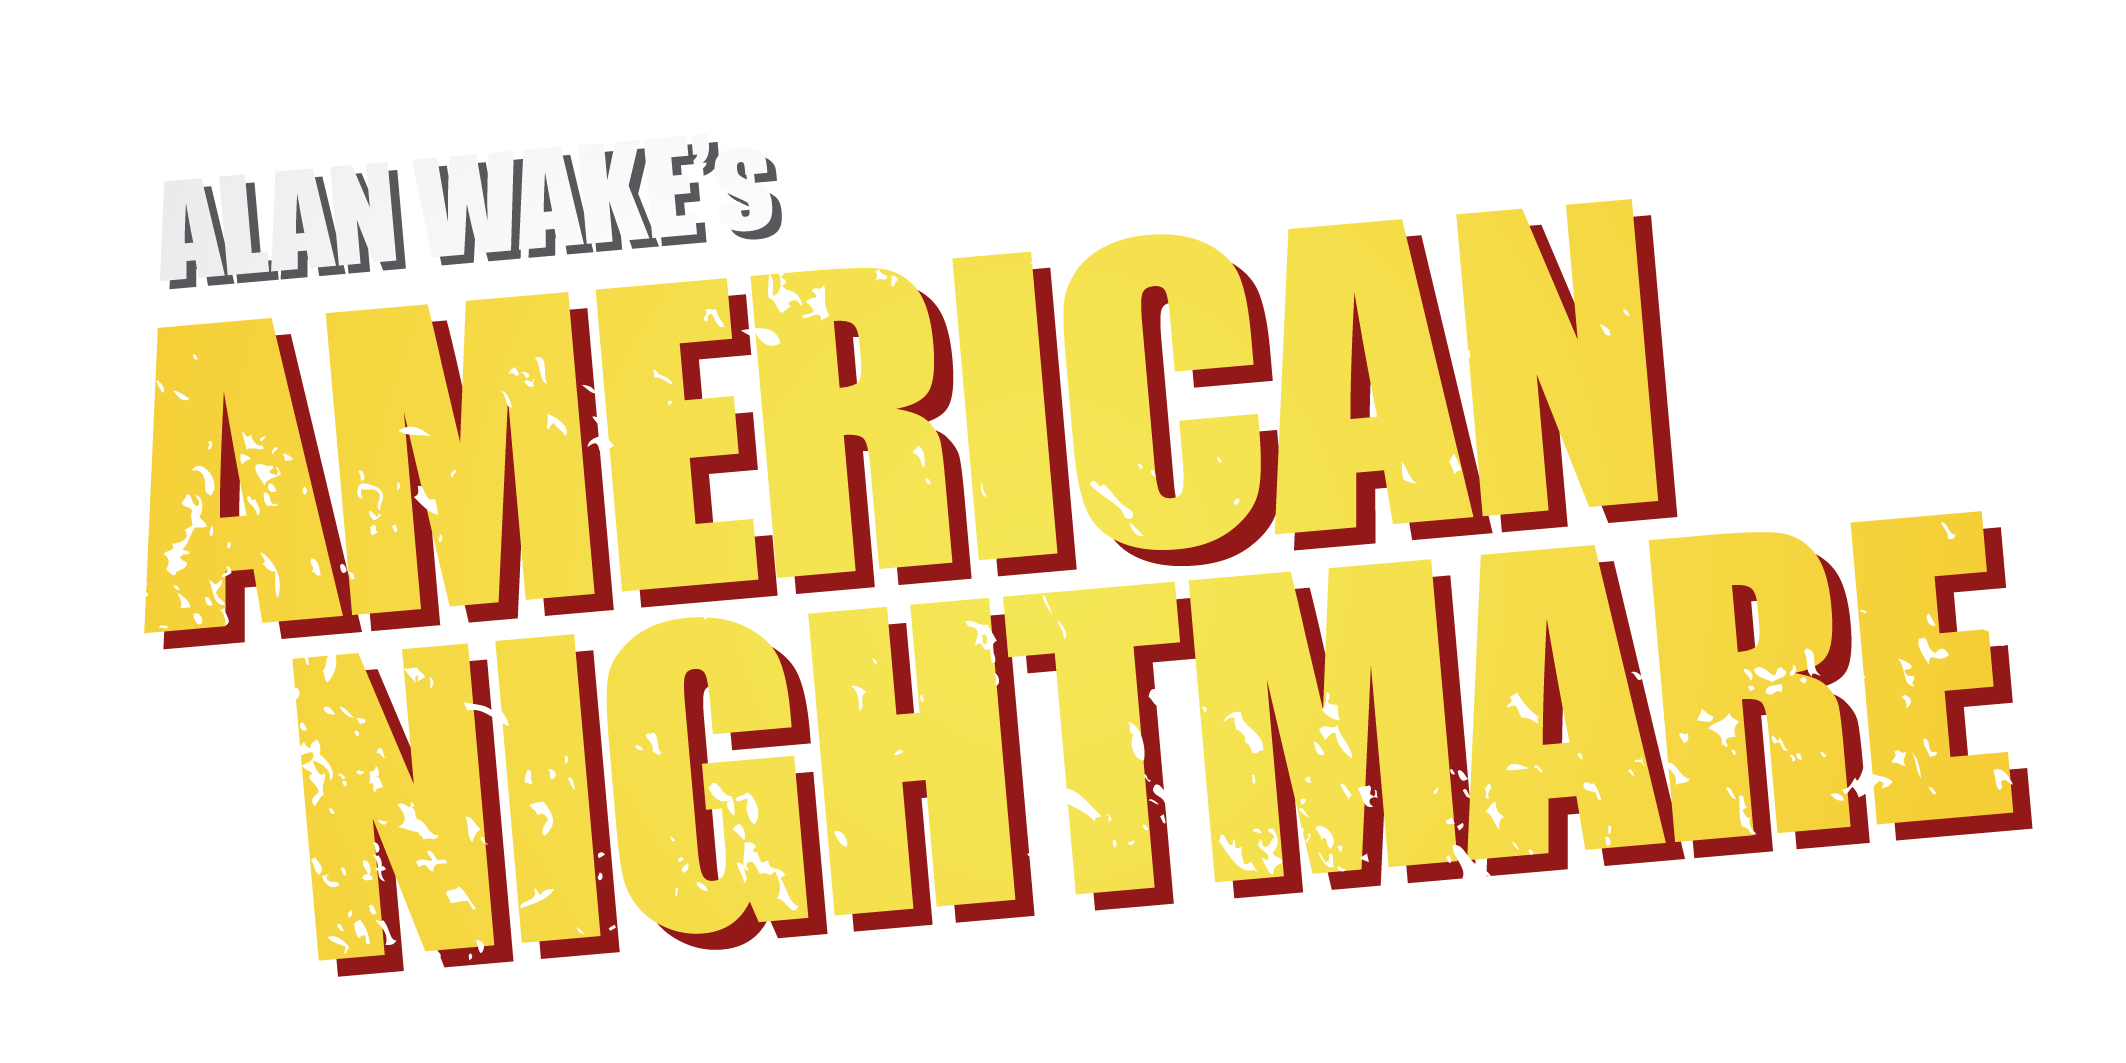 High Resolution Wallpaper   Alan Wake's American Nightmare 2126x1063 px